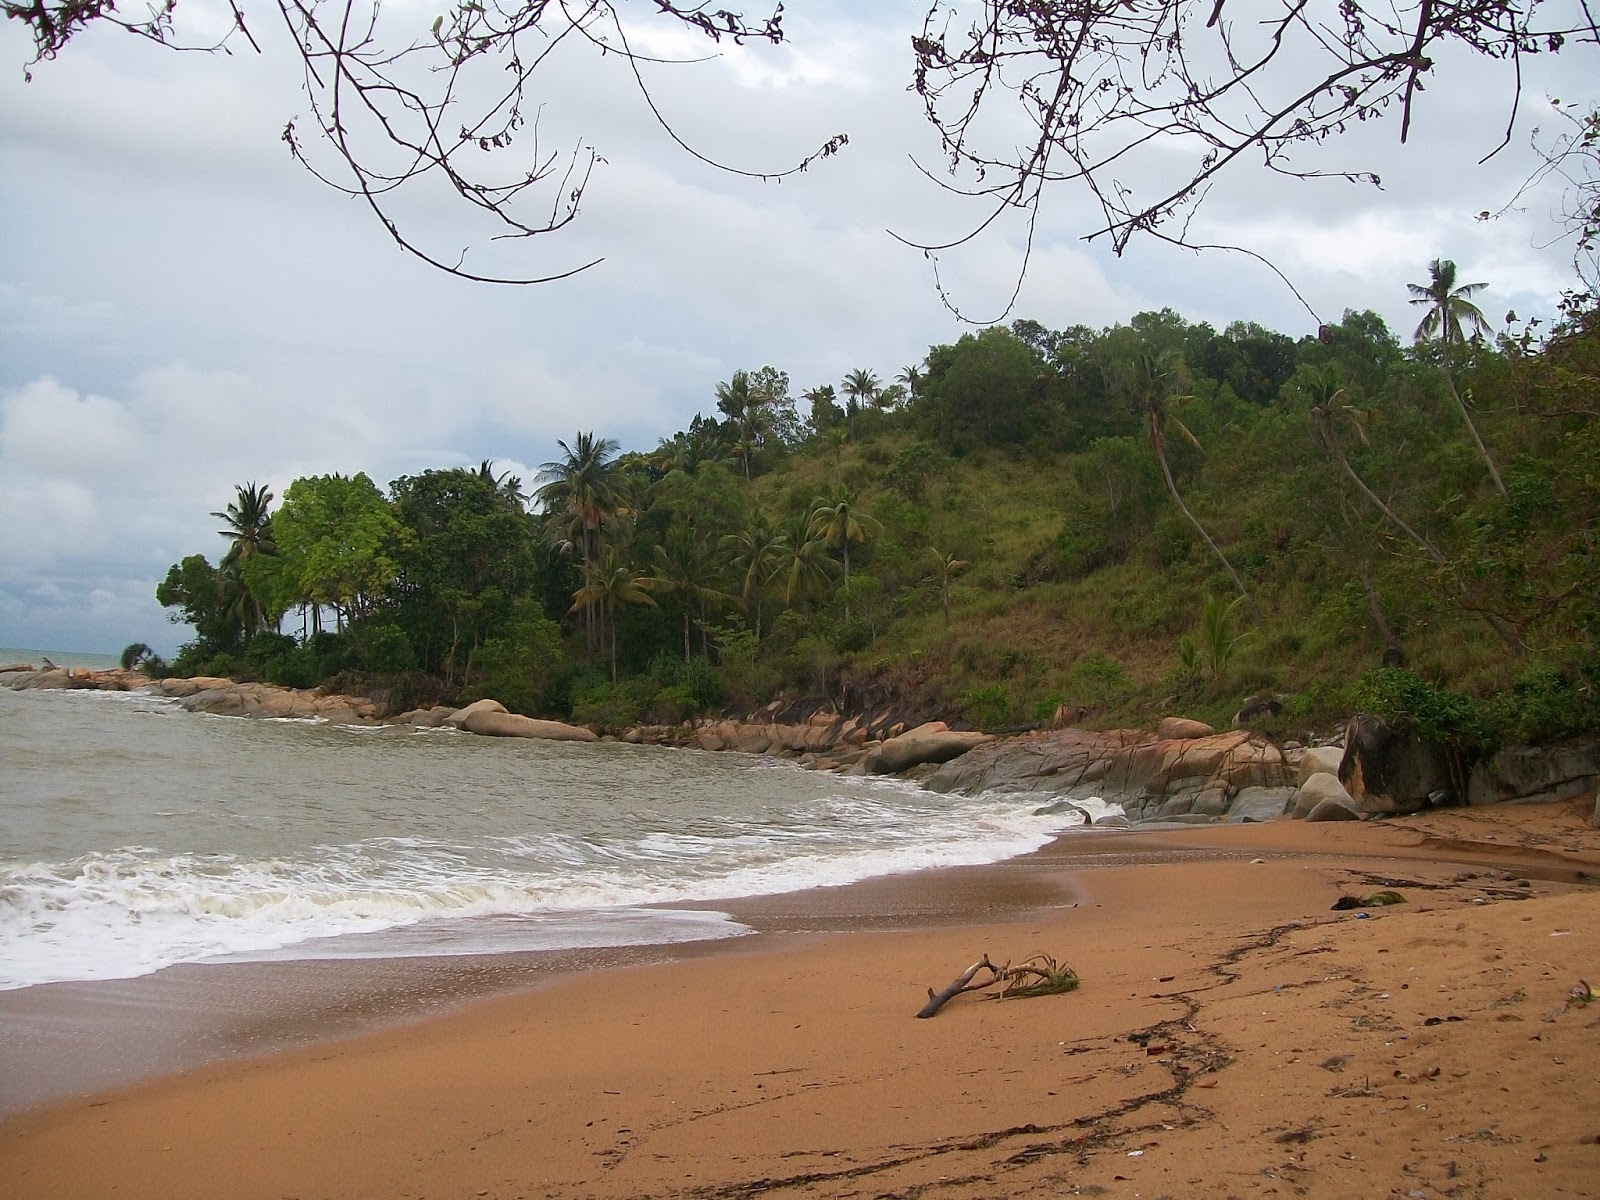 Taman Wisata Pasir Pendek Singkawang Pontianak 100 5134 Kolam Renang